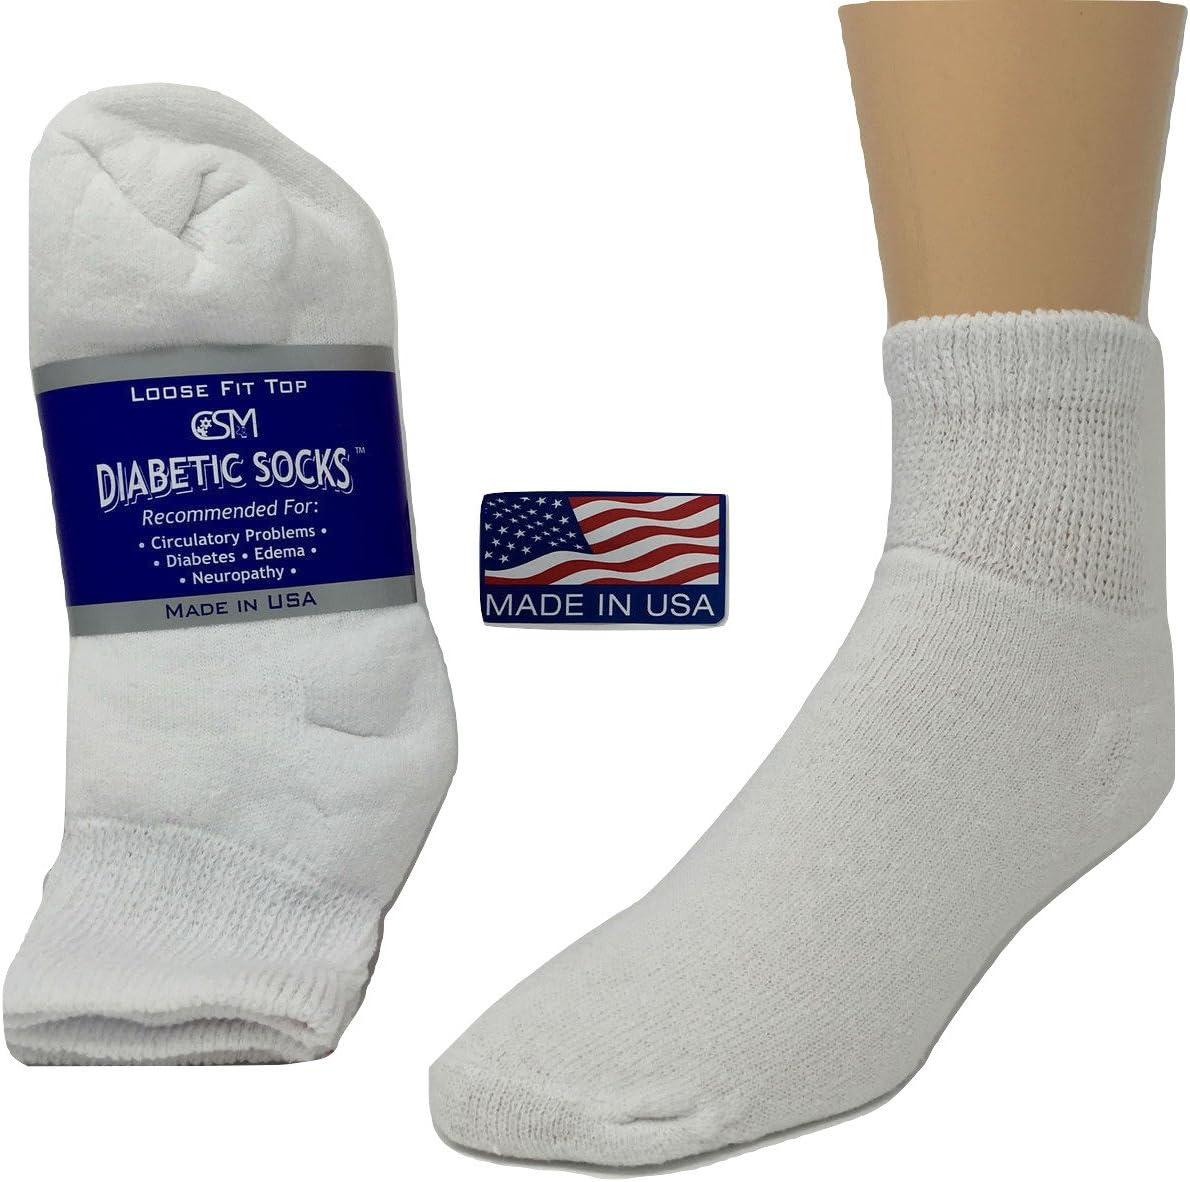 12 Pairs Mens Womens No Show Low Cut Socks 9-11 10-13 13-15 Sock Size USA Made